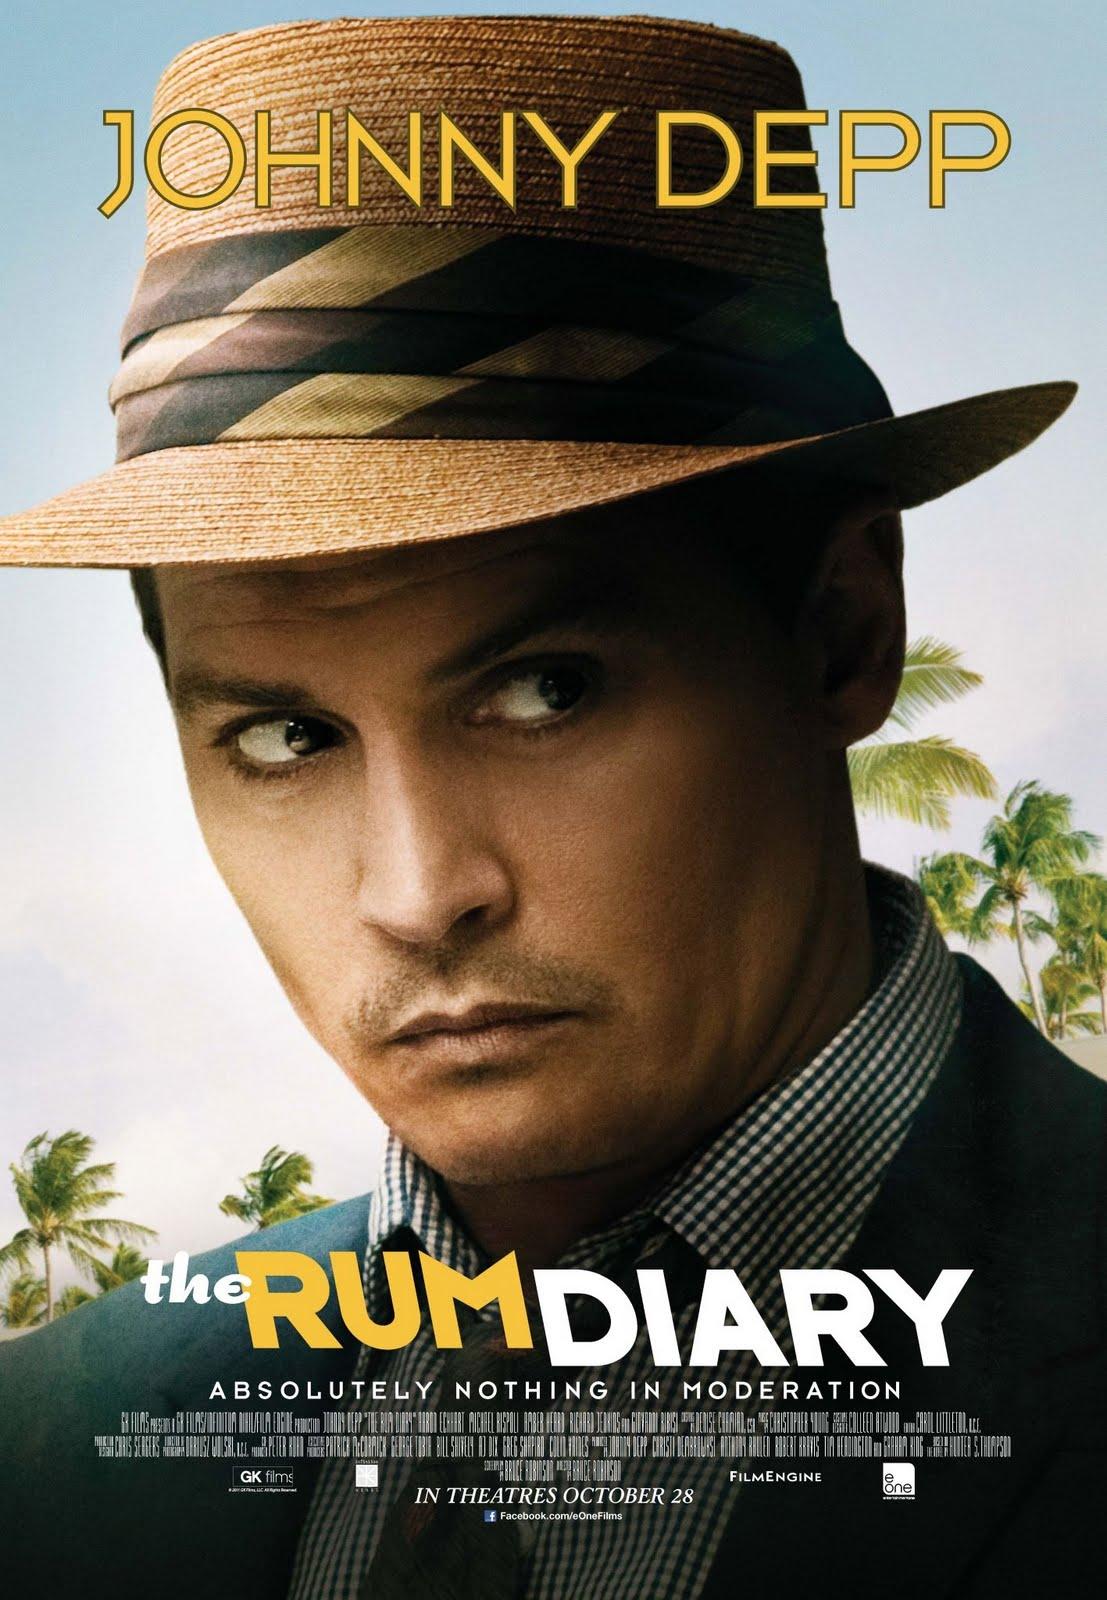 http://3.bp.blogspot.com/-LUNWK0t3CmU/T9uqeU14lXI/AAAAAAAAACo/MKHC03oqoM8/s1600/Johnny+Depp+Rum+Diary.jpg